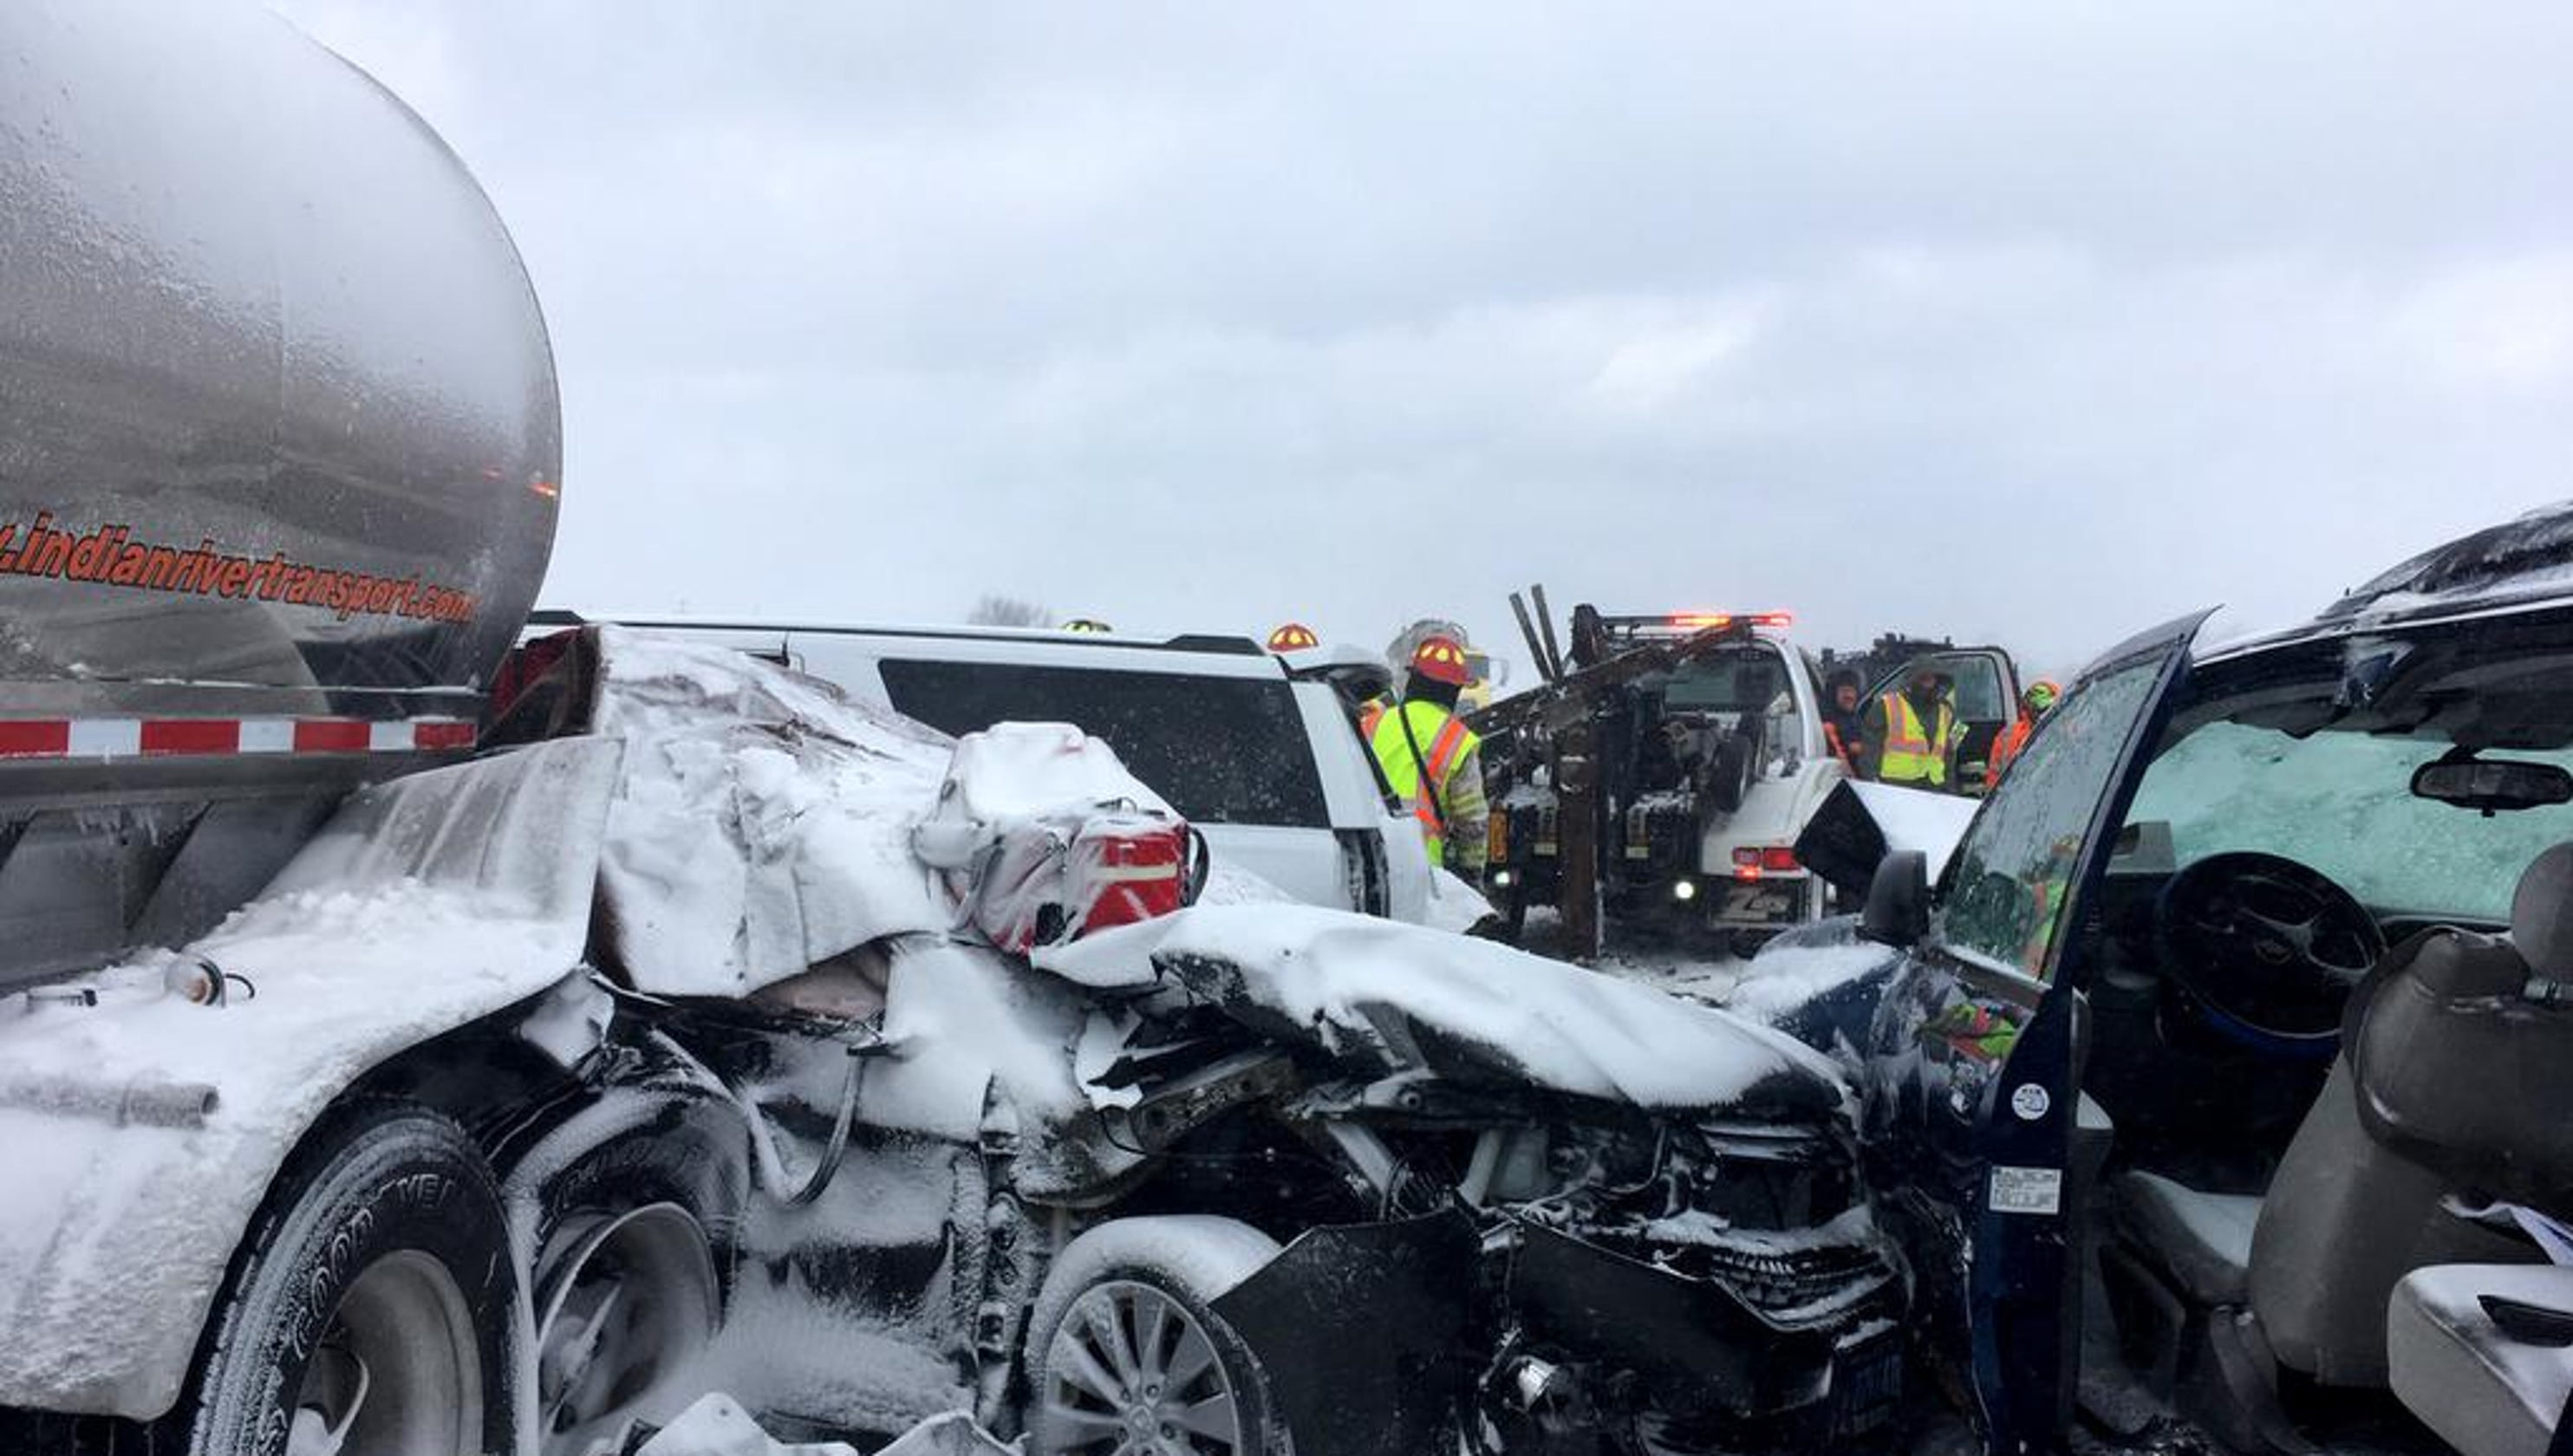 Interstate 41 pileup: New bodycam, dashcam video shows aftermath